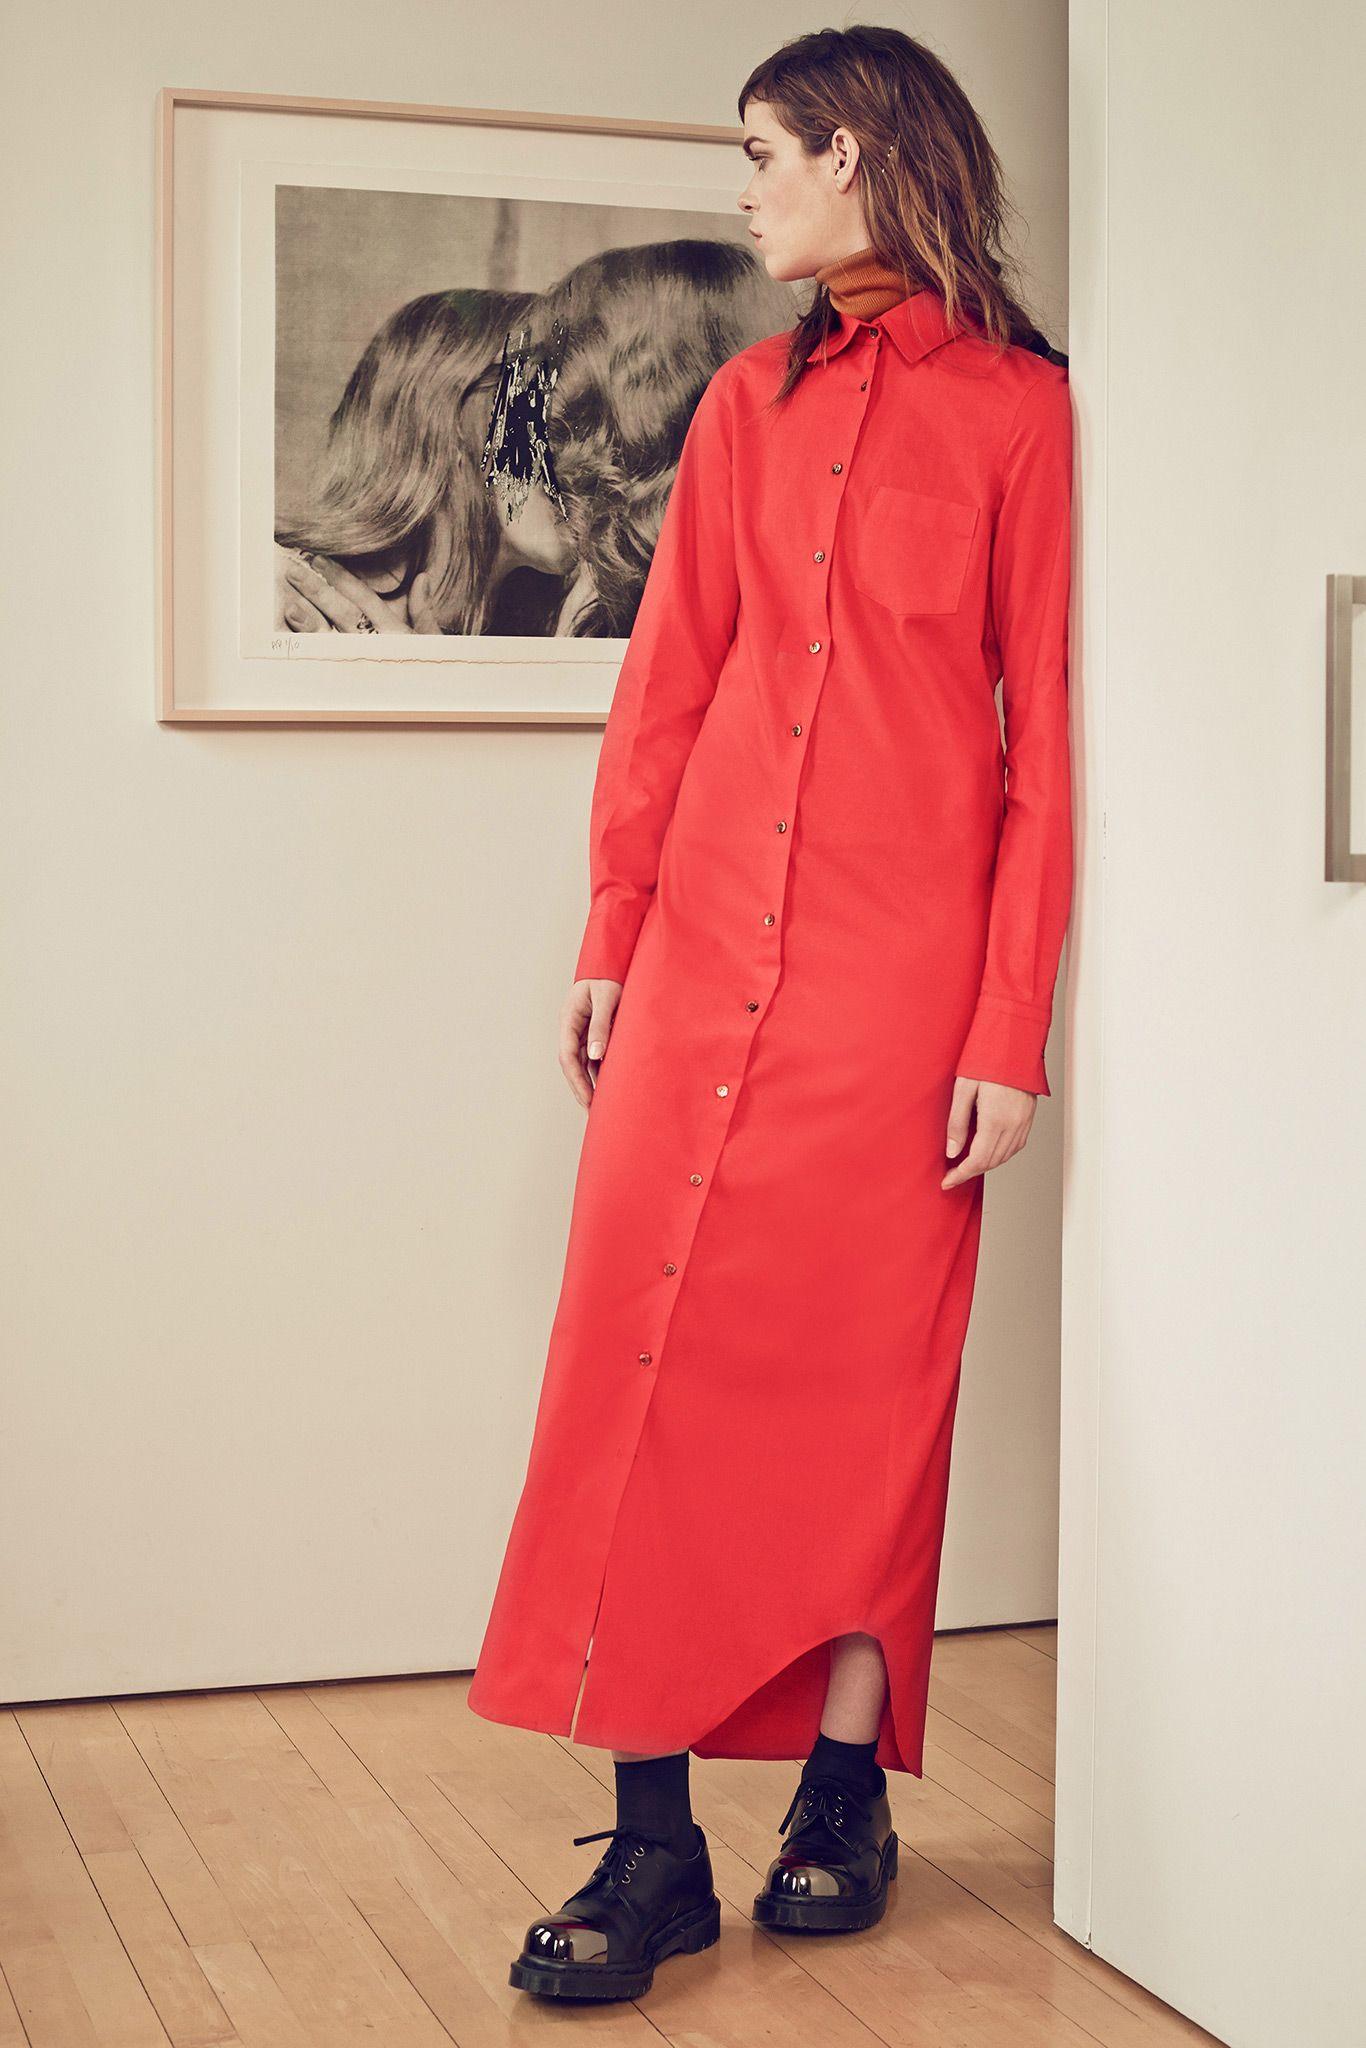 Organic by John Patrick - Fall 2015 Ready-to-Wear - Look 11 of 19